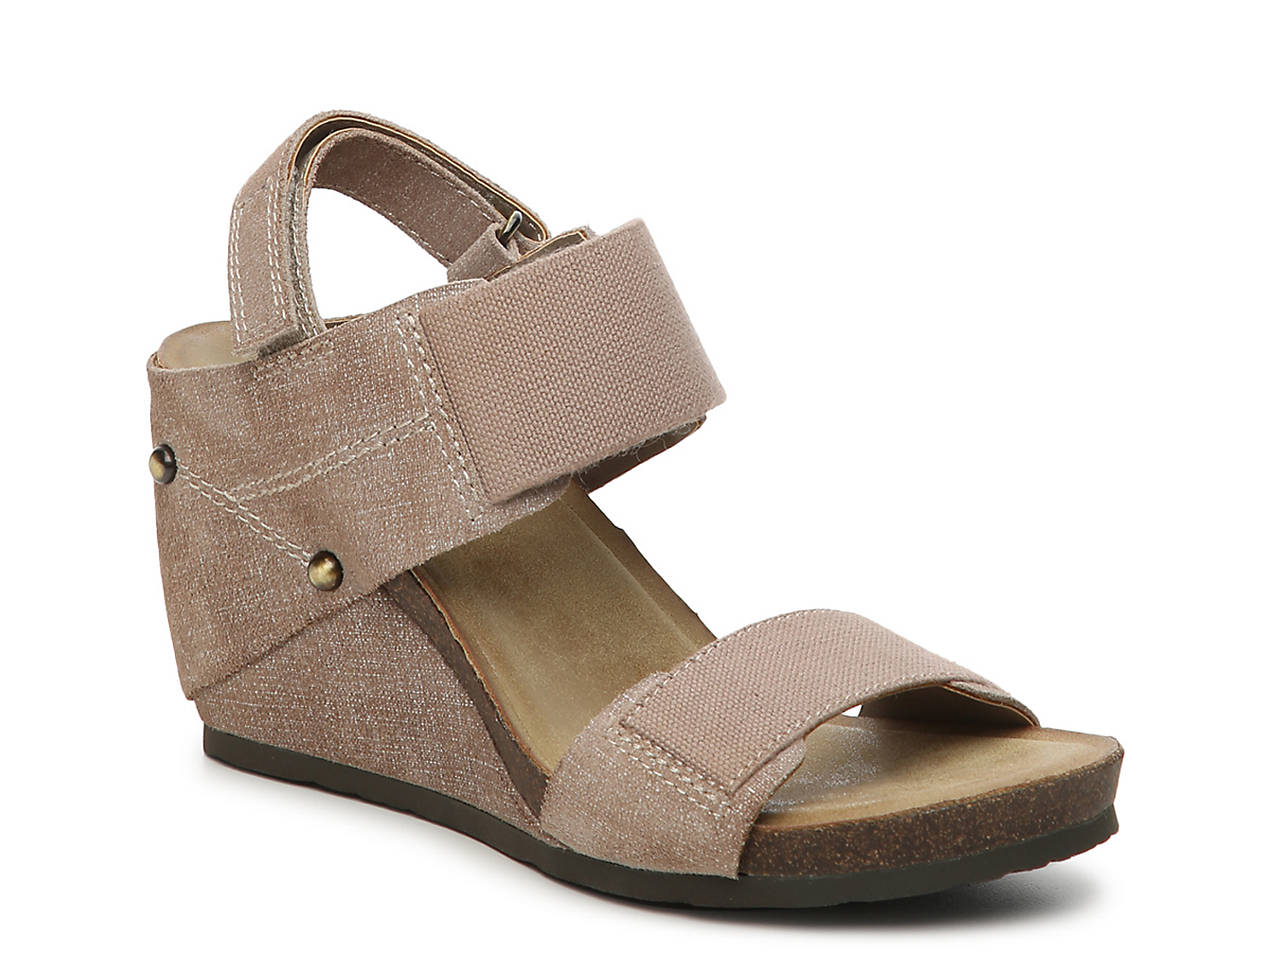 Civico 10 Pelican Platform Wedge Sandal Womens Shoes Dsw Tendencies Sandals Footbed 2 Strap Brown 42